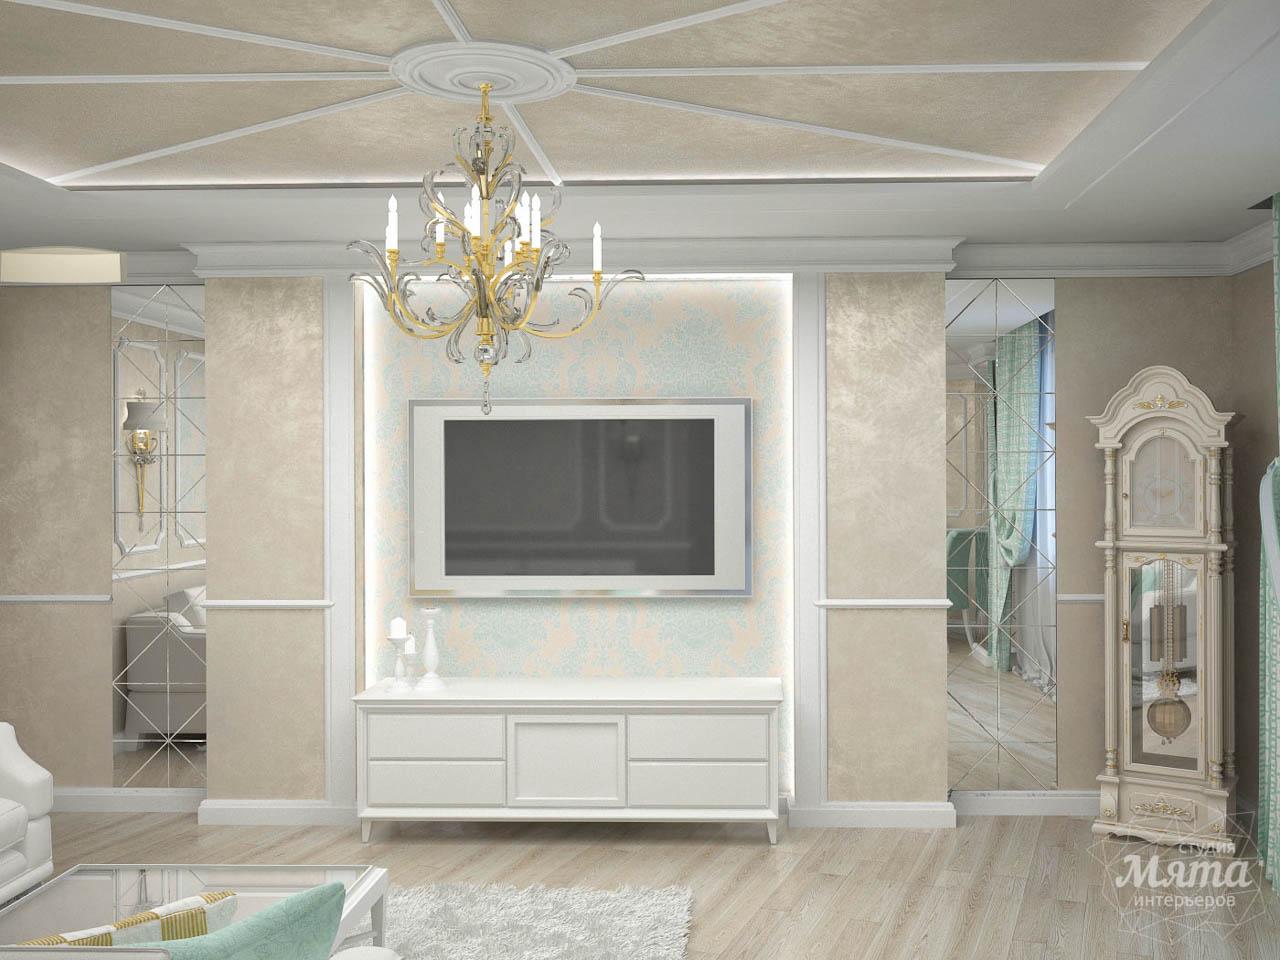 Дизайн интерьера и ремонт трехкомнатной квартиры по ул. 8 Марта 190 img41409718